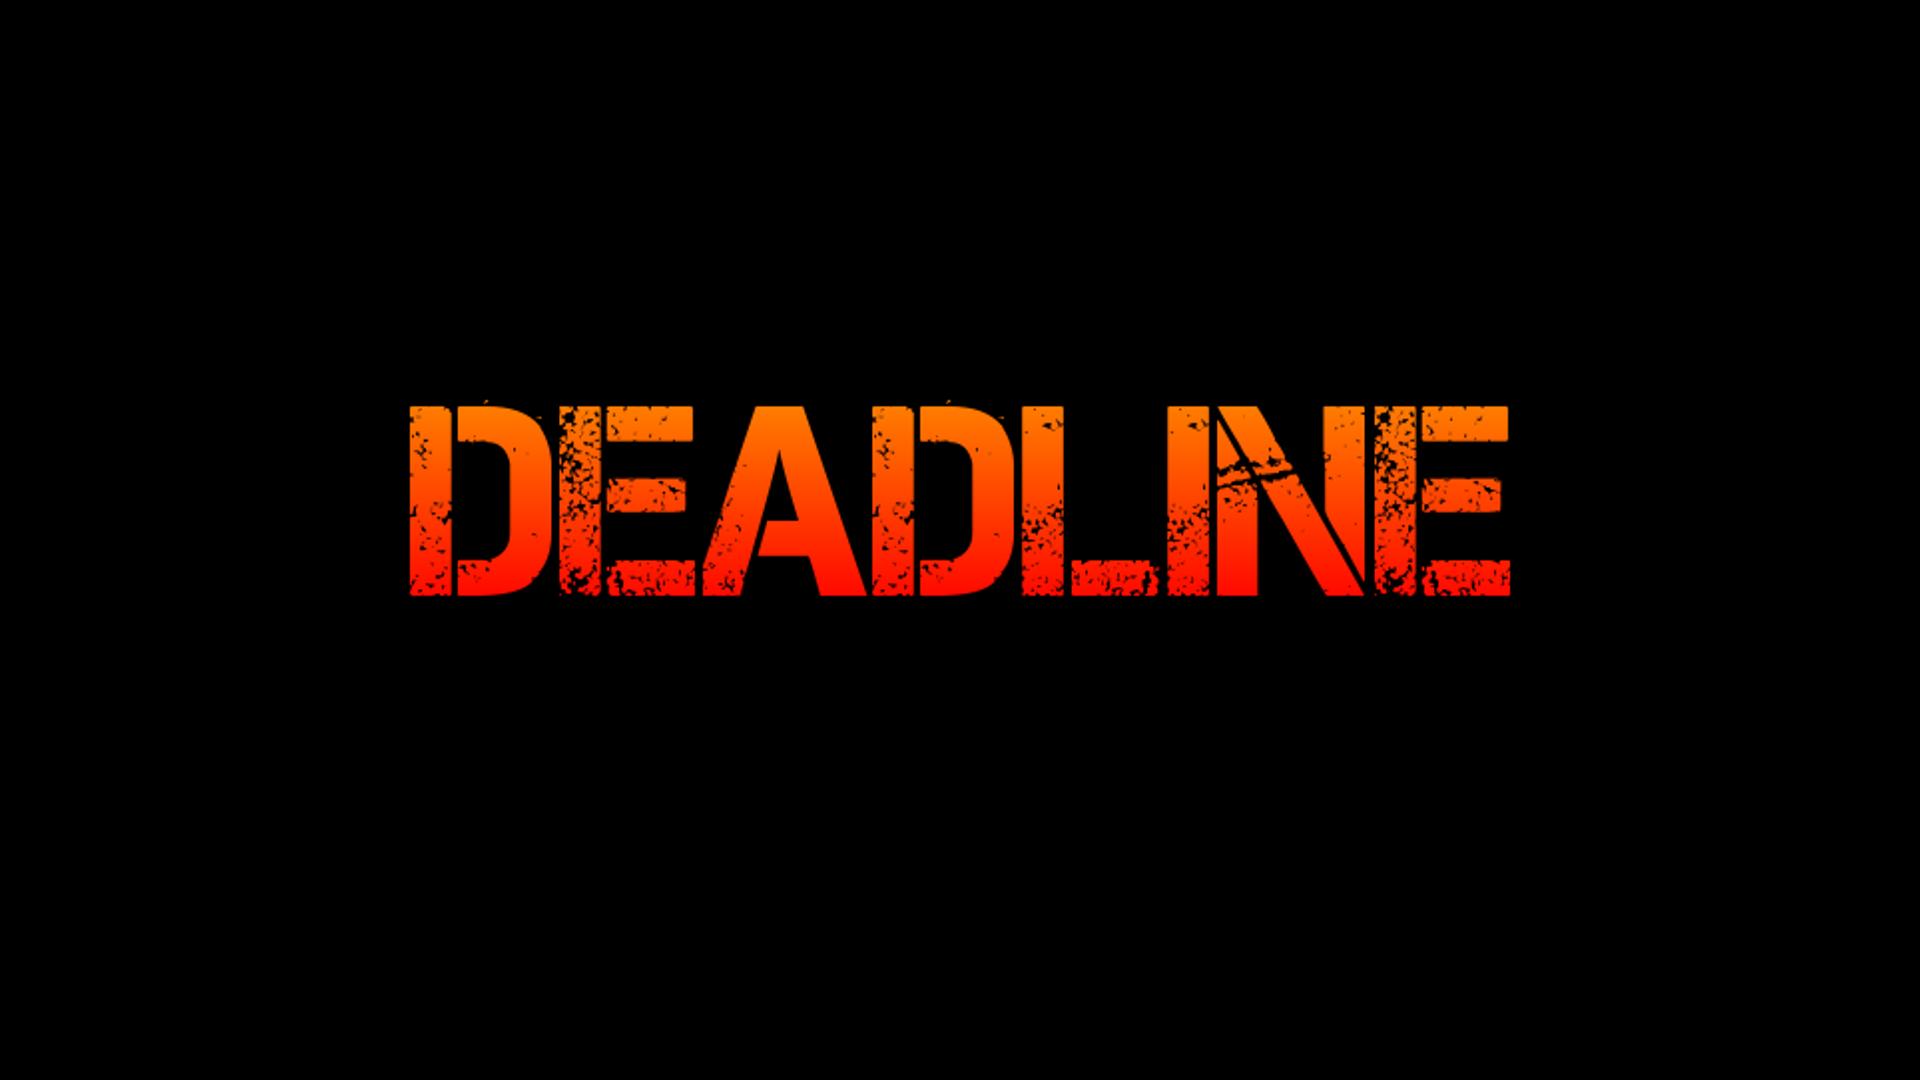 deadline hollywood logo - photo #10